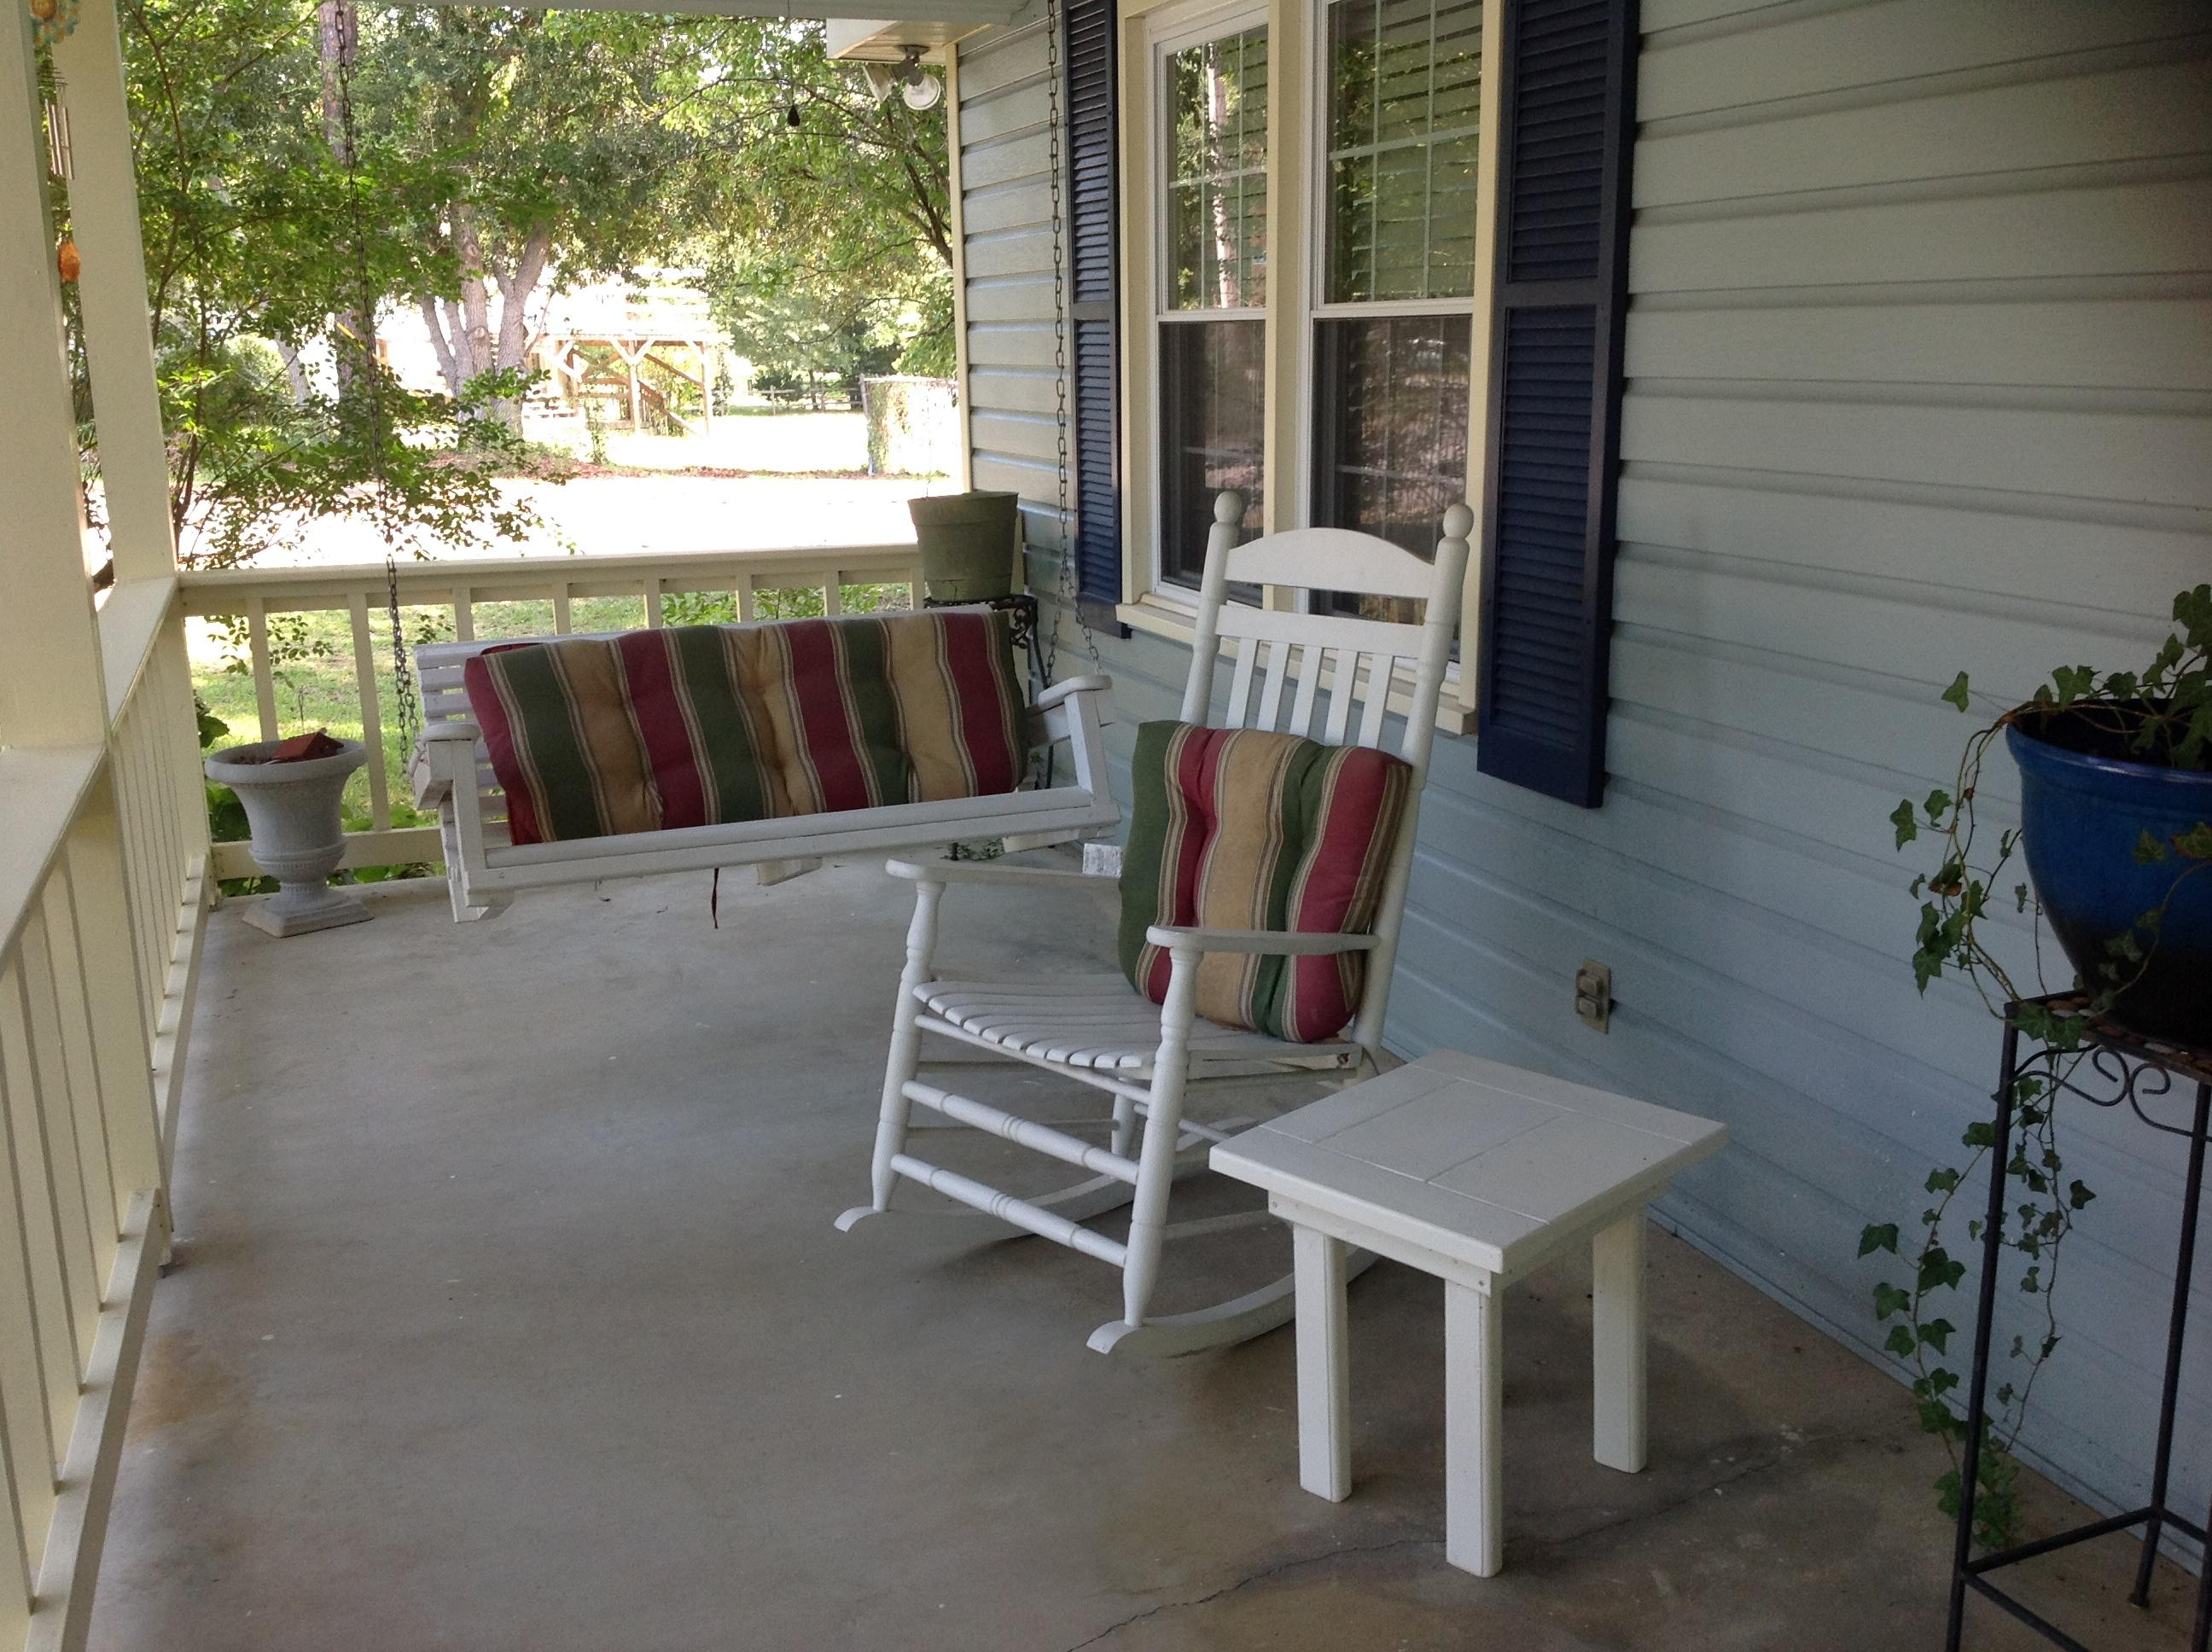 Belvedere II Homes For Sale - 122 Dogwood, Eutawville, SC - 39